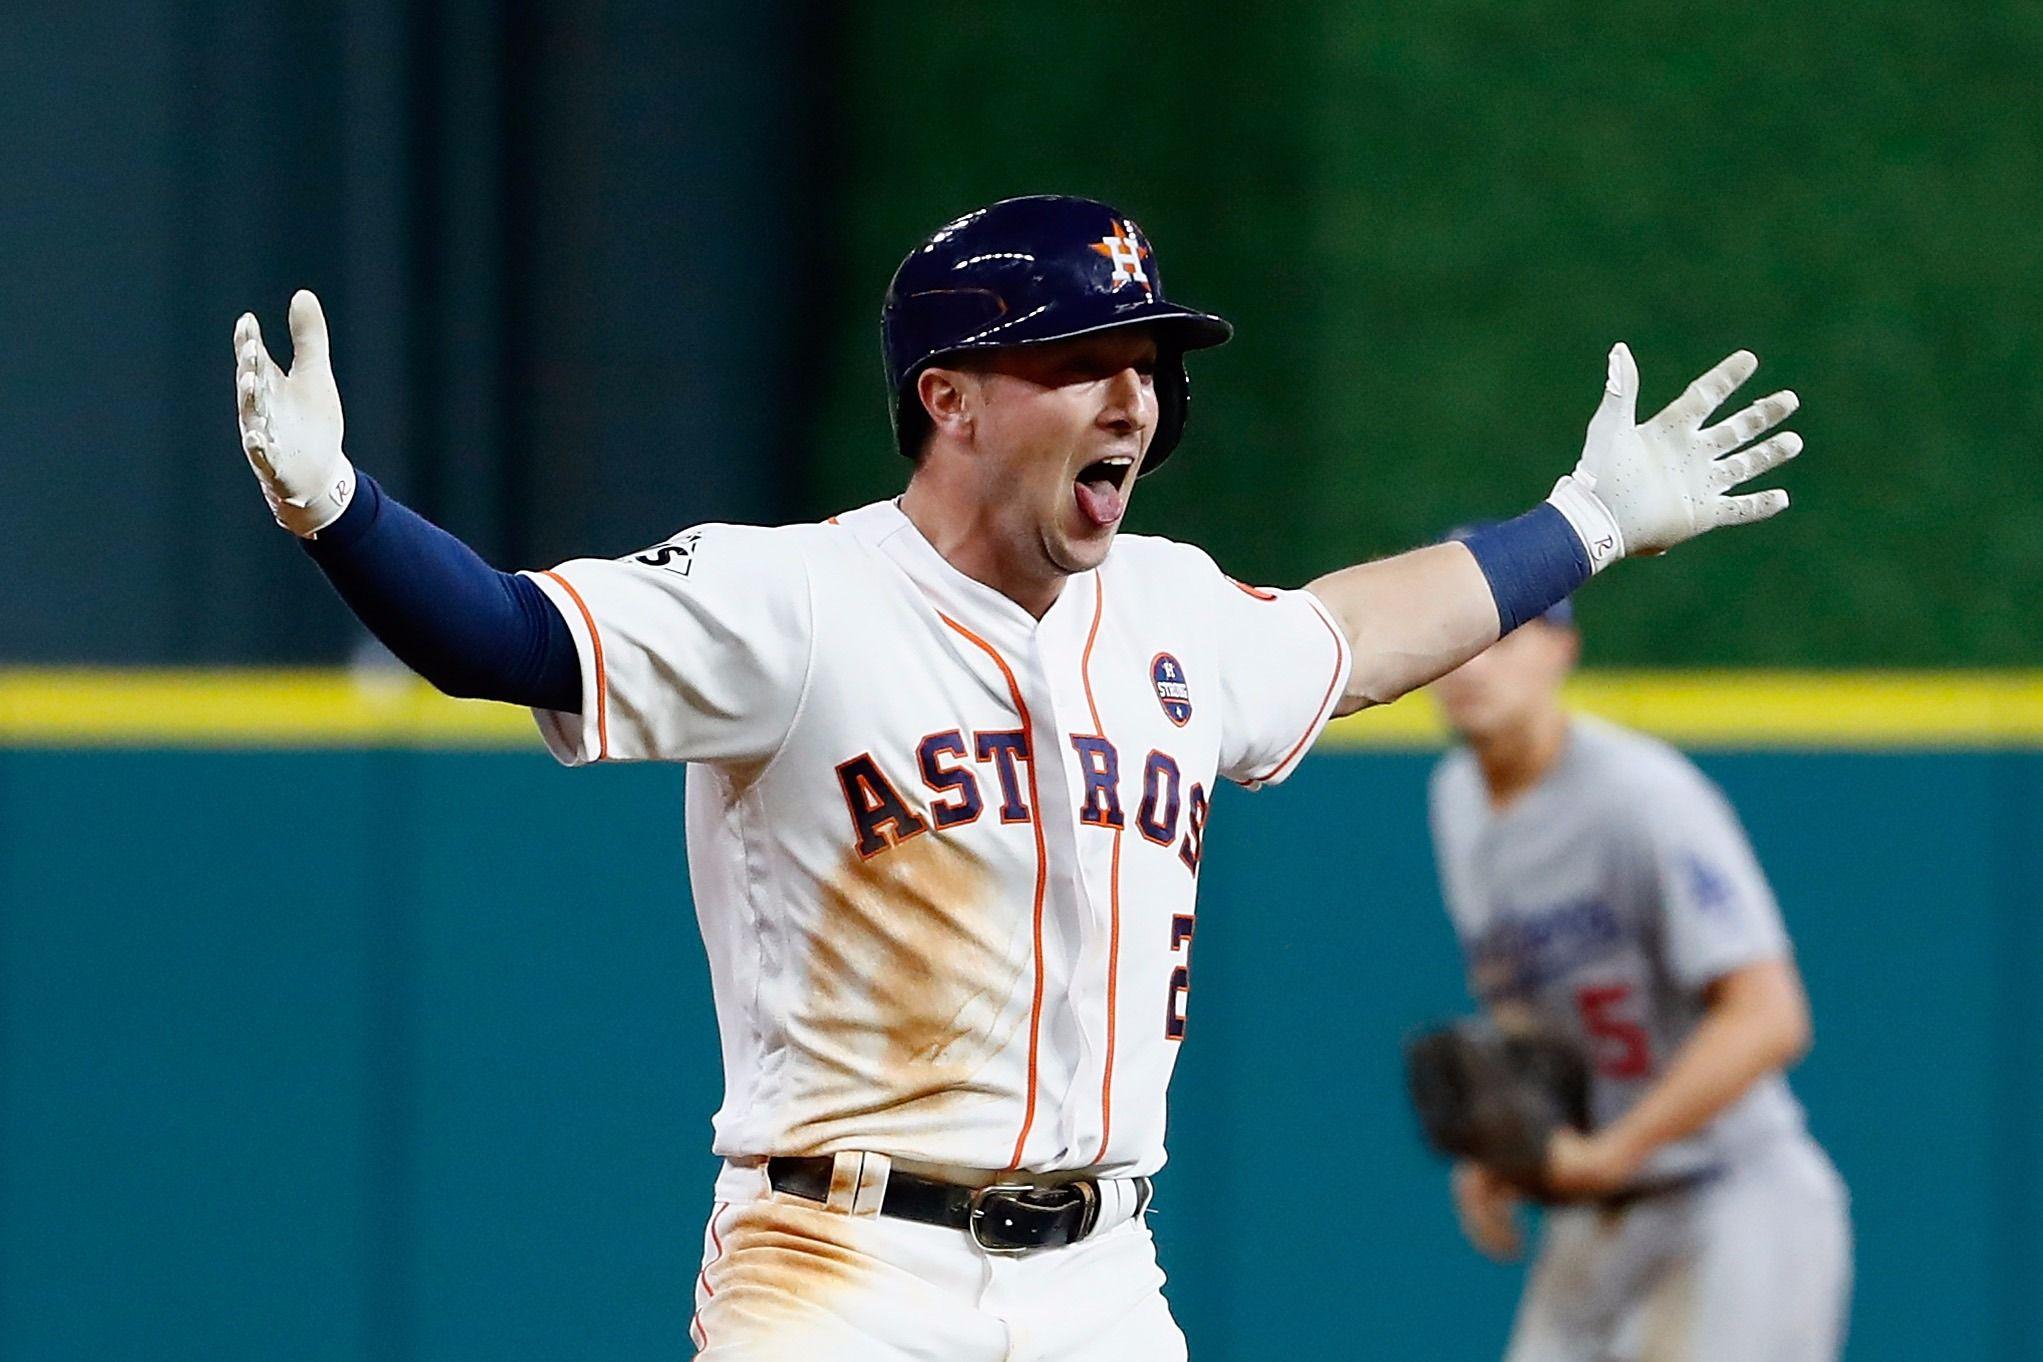 promo code 3b61b 2067c Alex Bregman Is Baseball's Next Jewish Star – The Forward